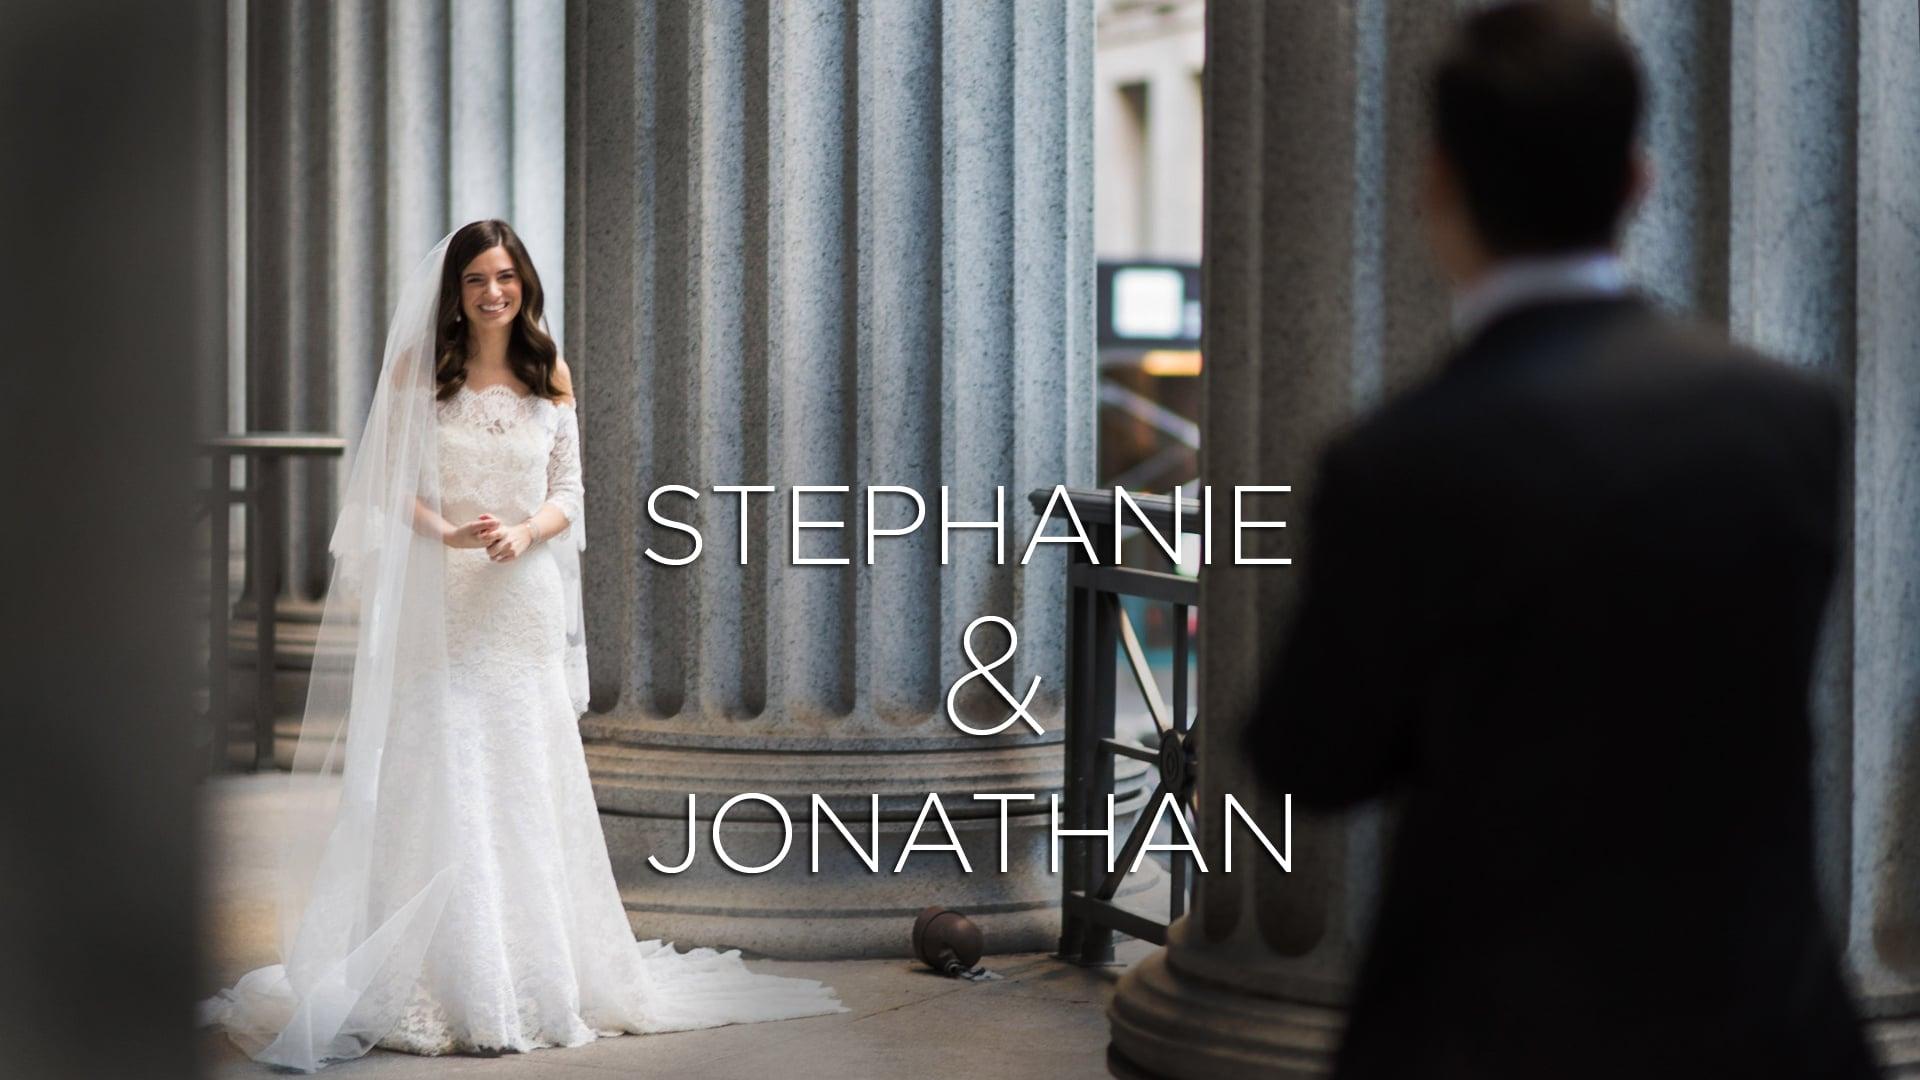 Stephanie + Jonathan | New York, New York | Cipriani Wall Street